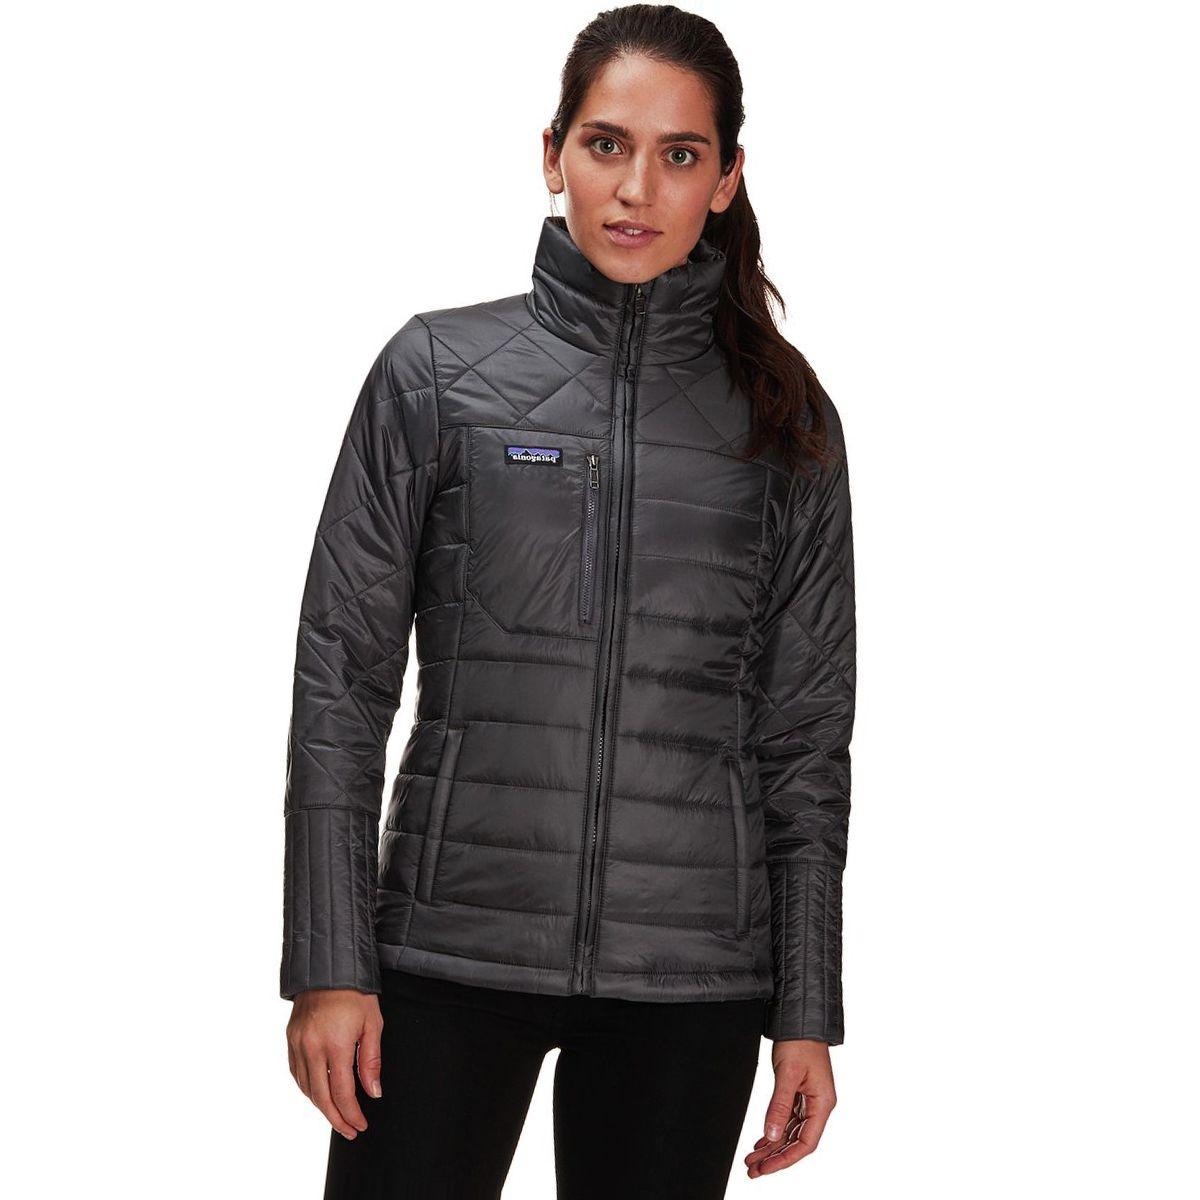 Patagonia Radalie Insulated Jacket - Women's